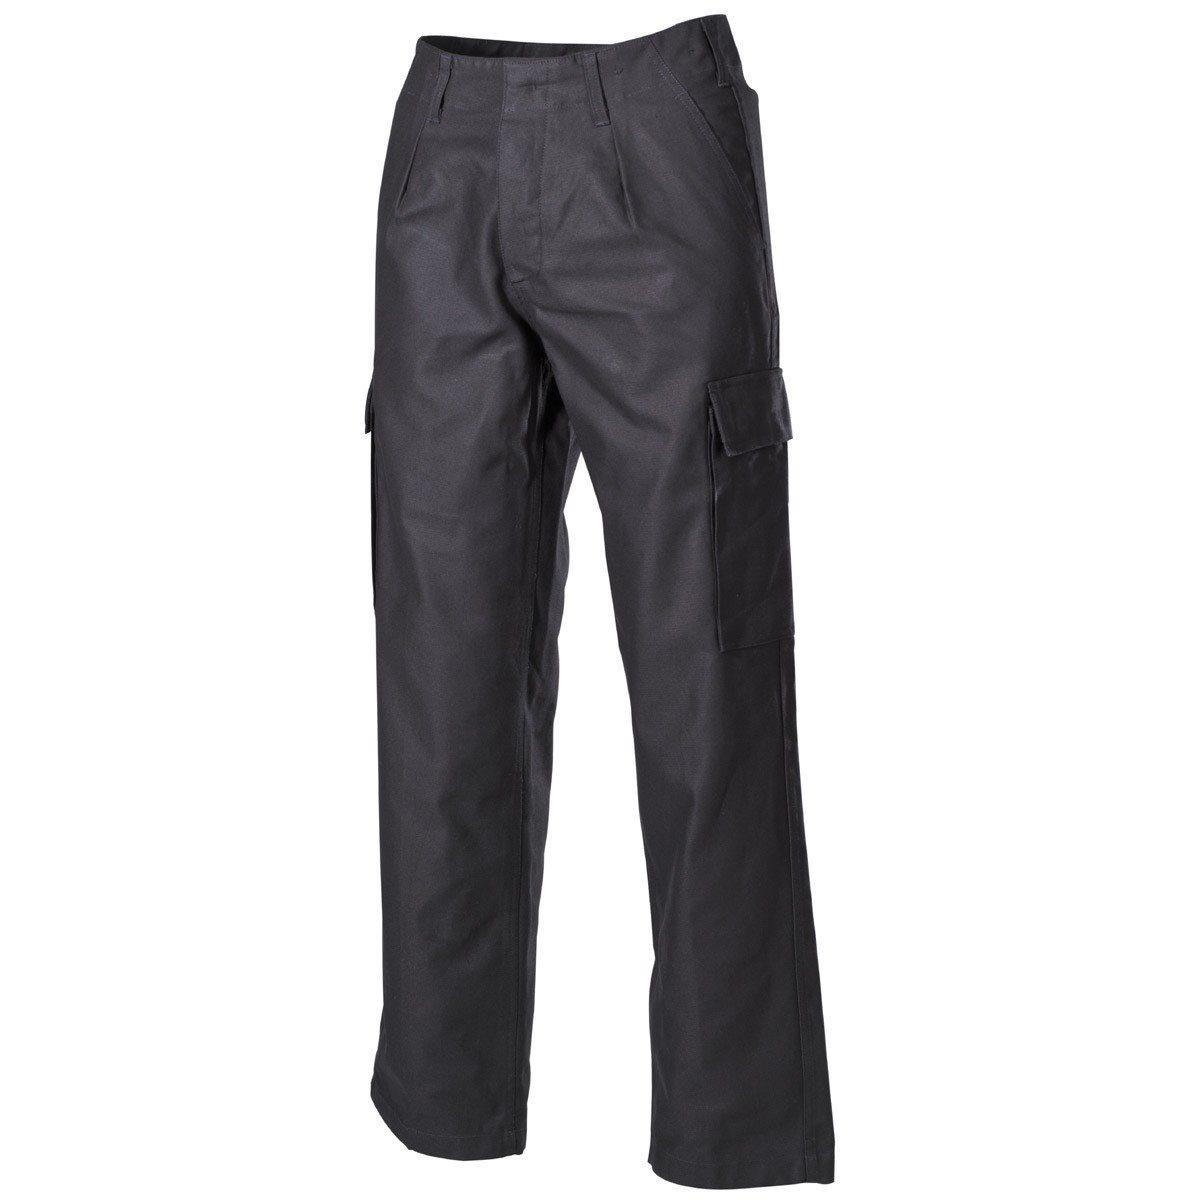 Pants BW moleskin BLACK MFH int. comp. 01102A L-11